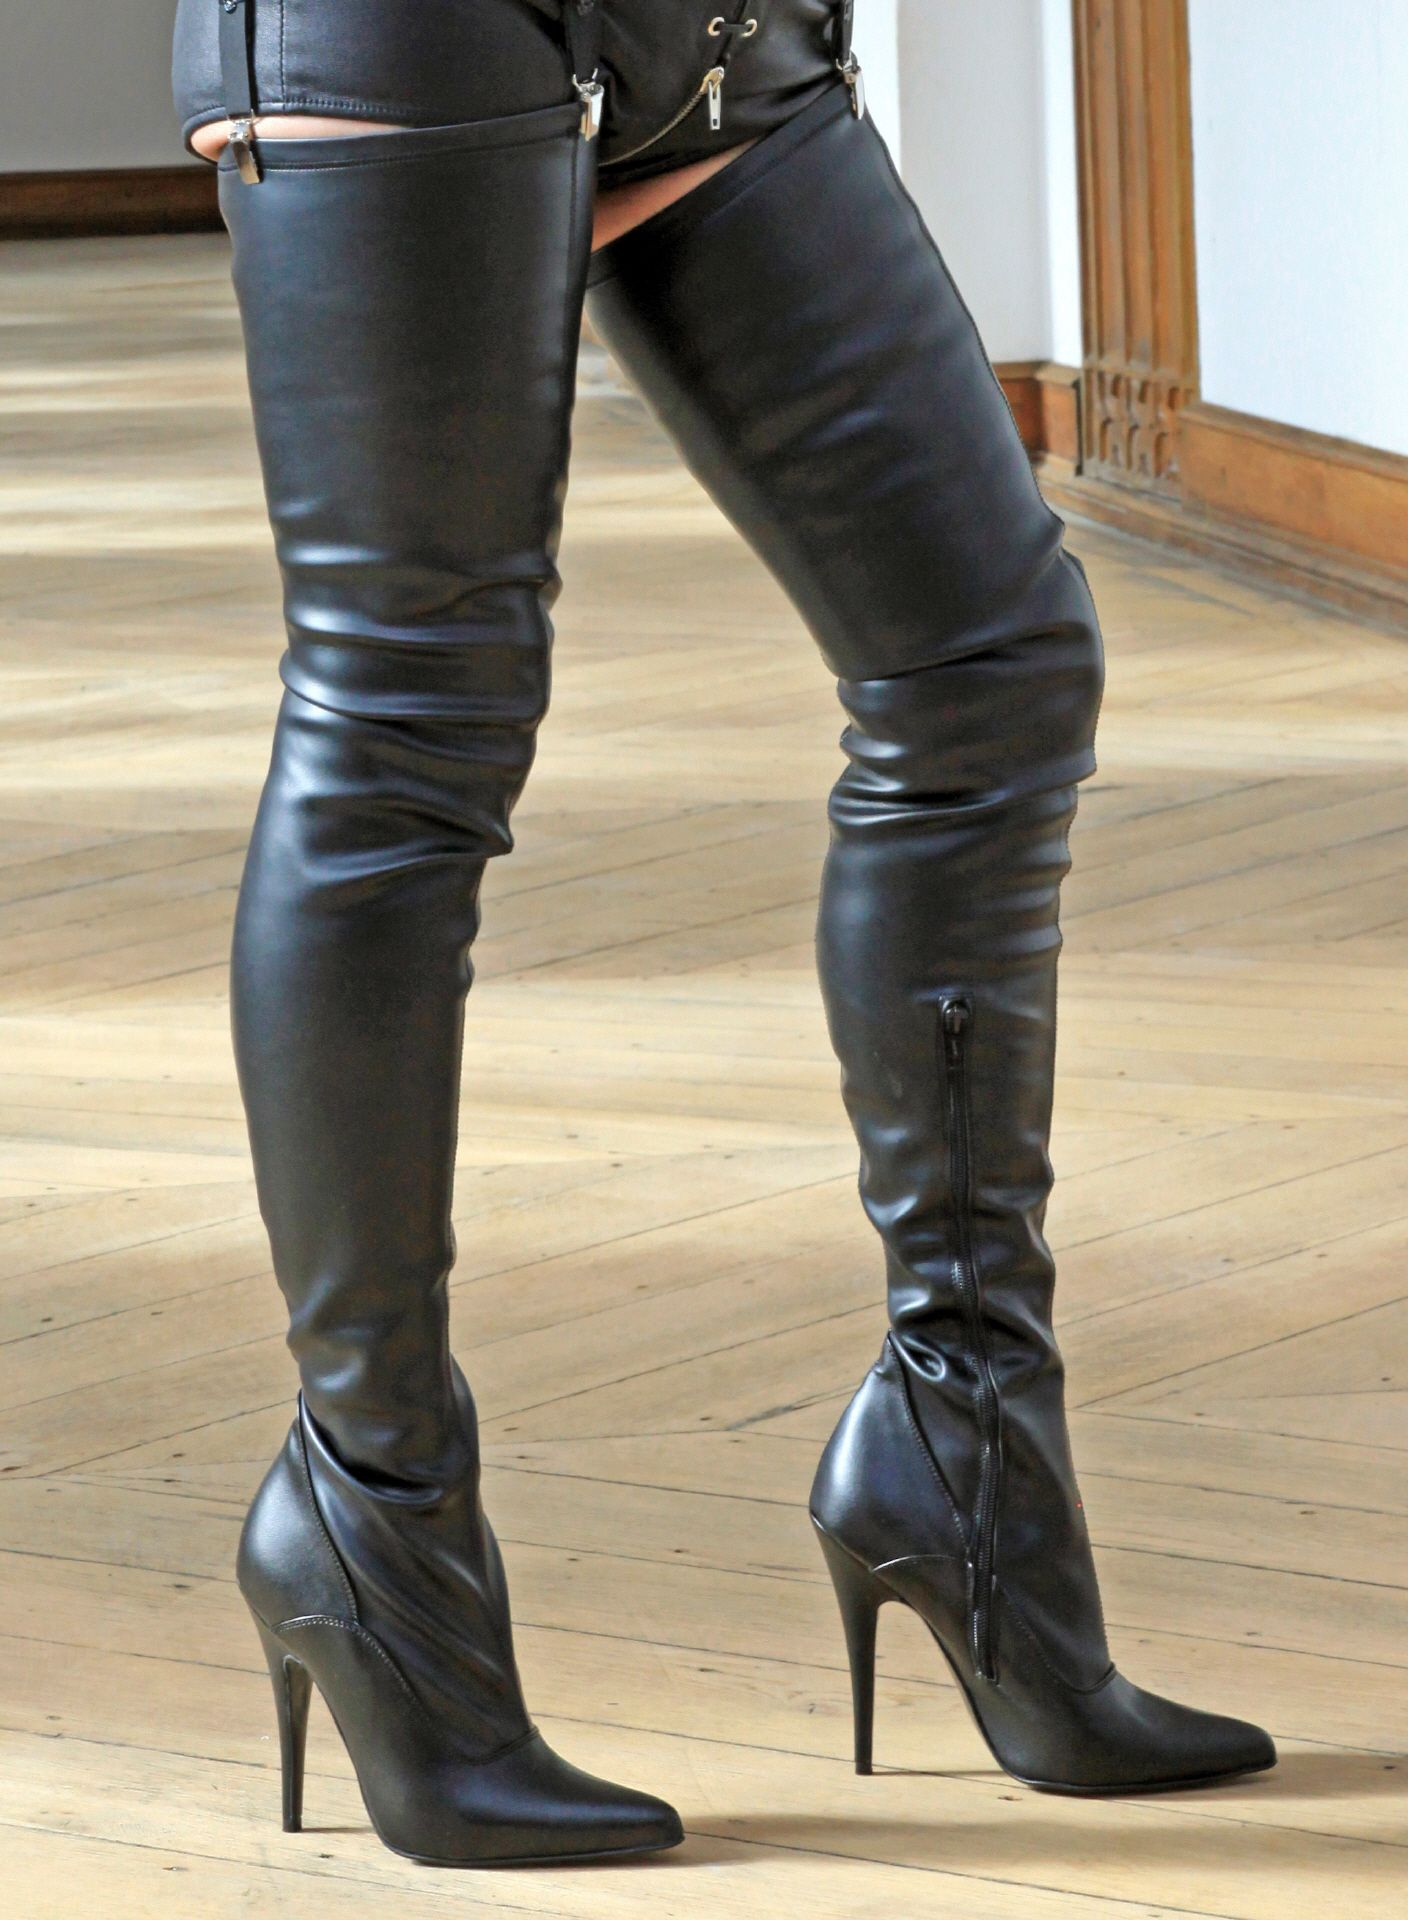 Schwarze Crotch Overknee Stiefel | Stiefel, Overknee